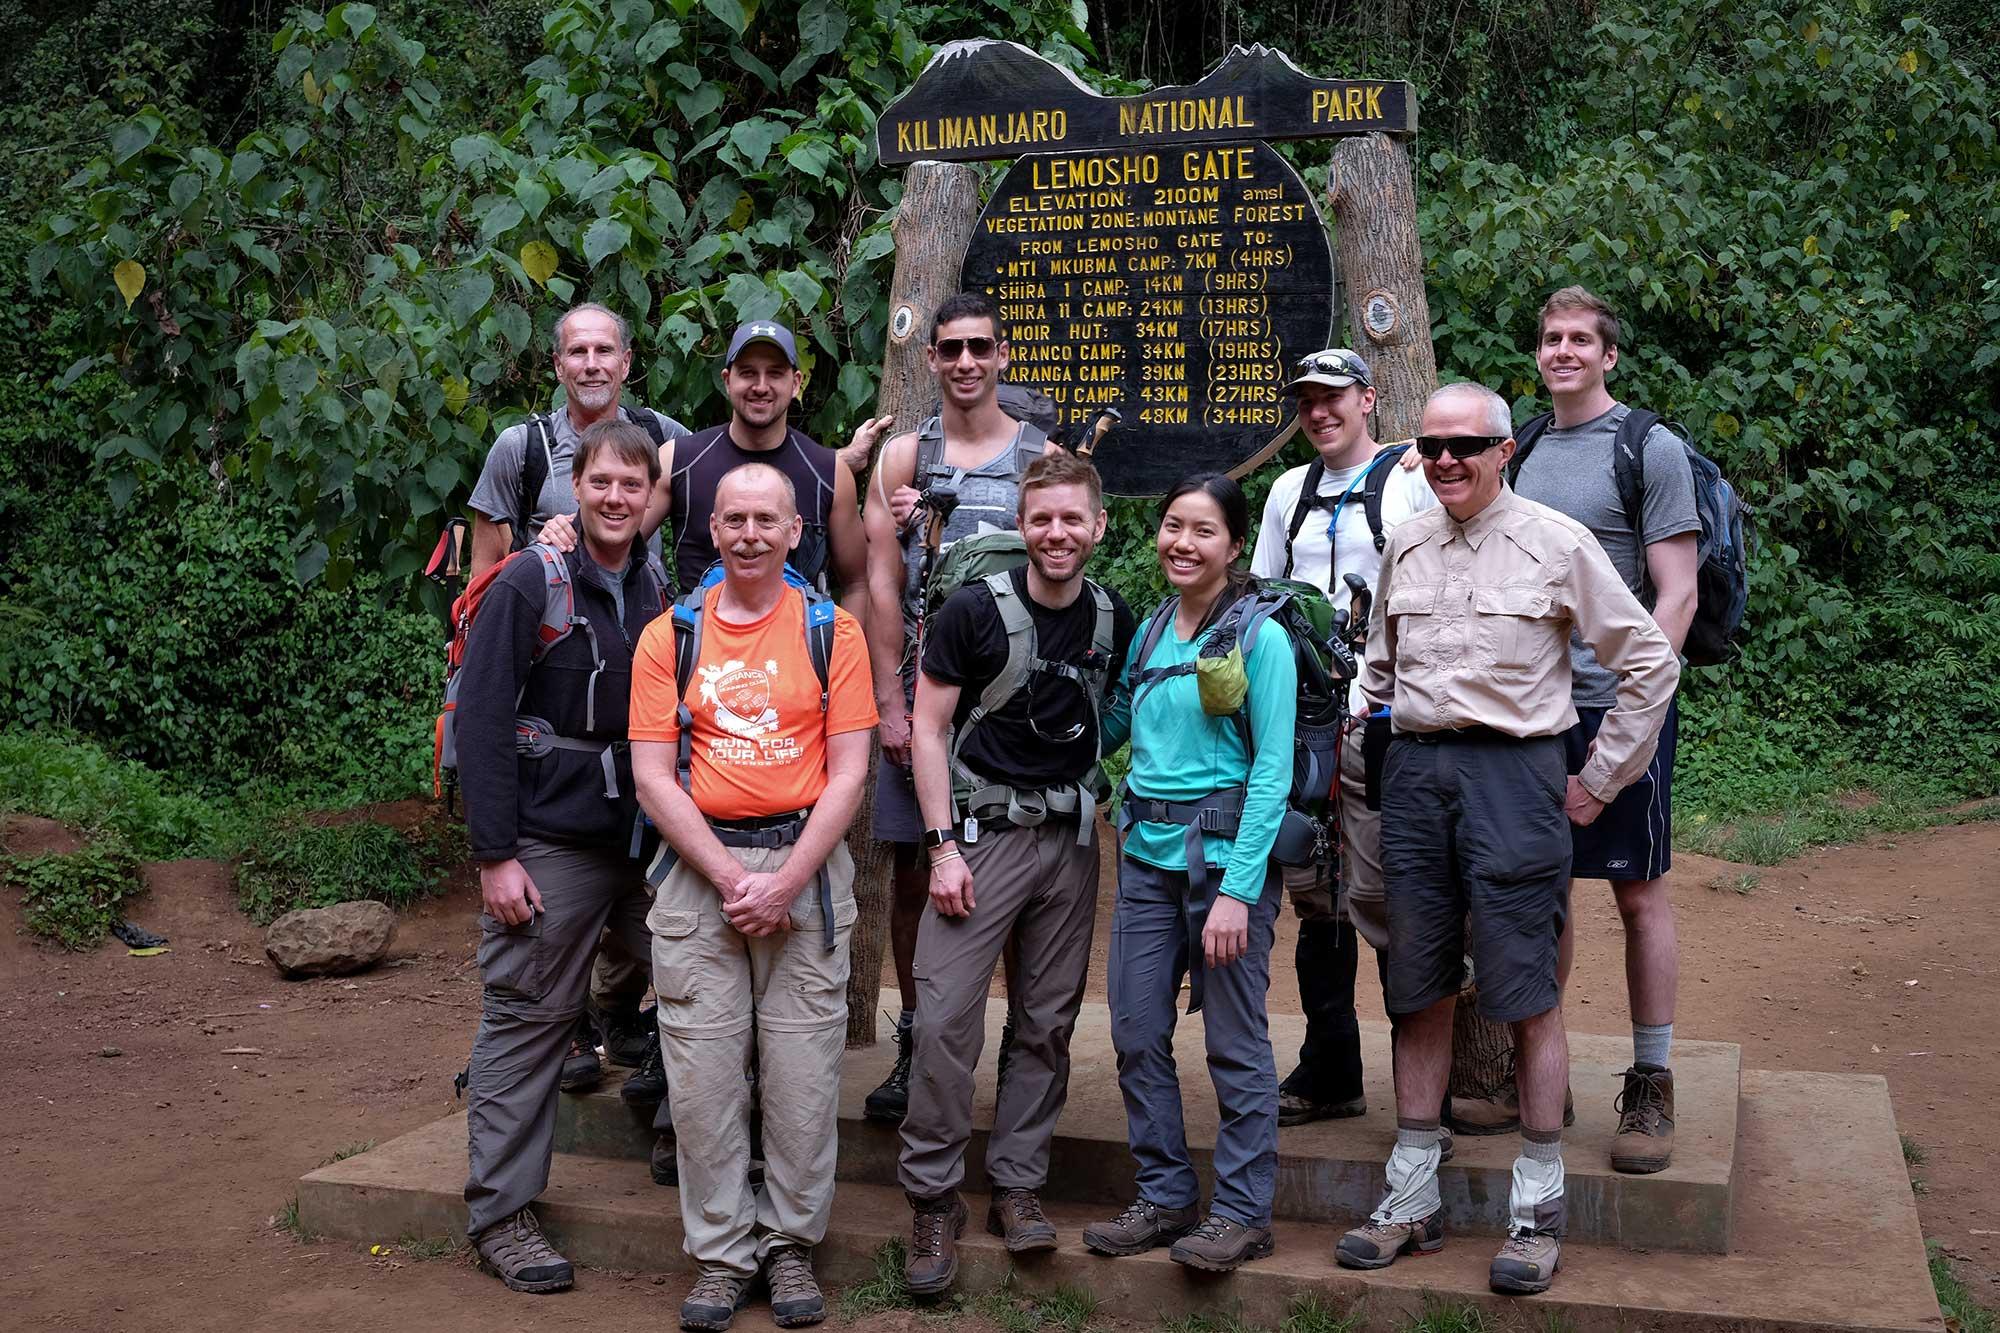 Banner-lemosho-gate-day-1-kilimanjaro.jpg